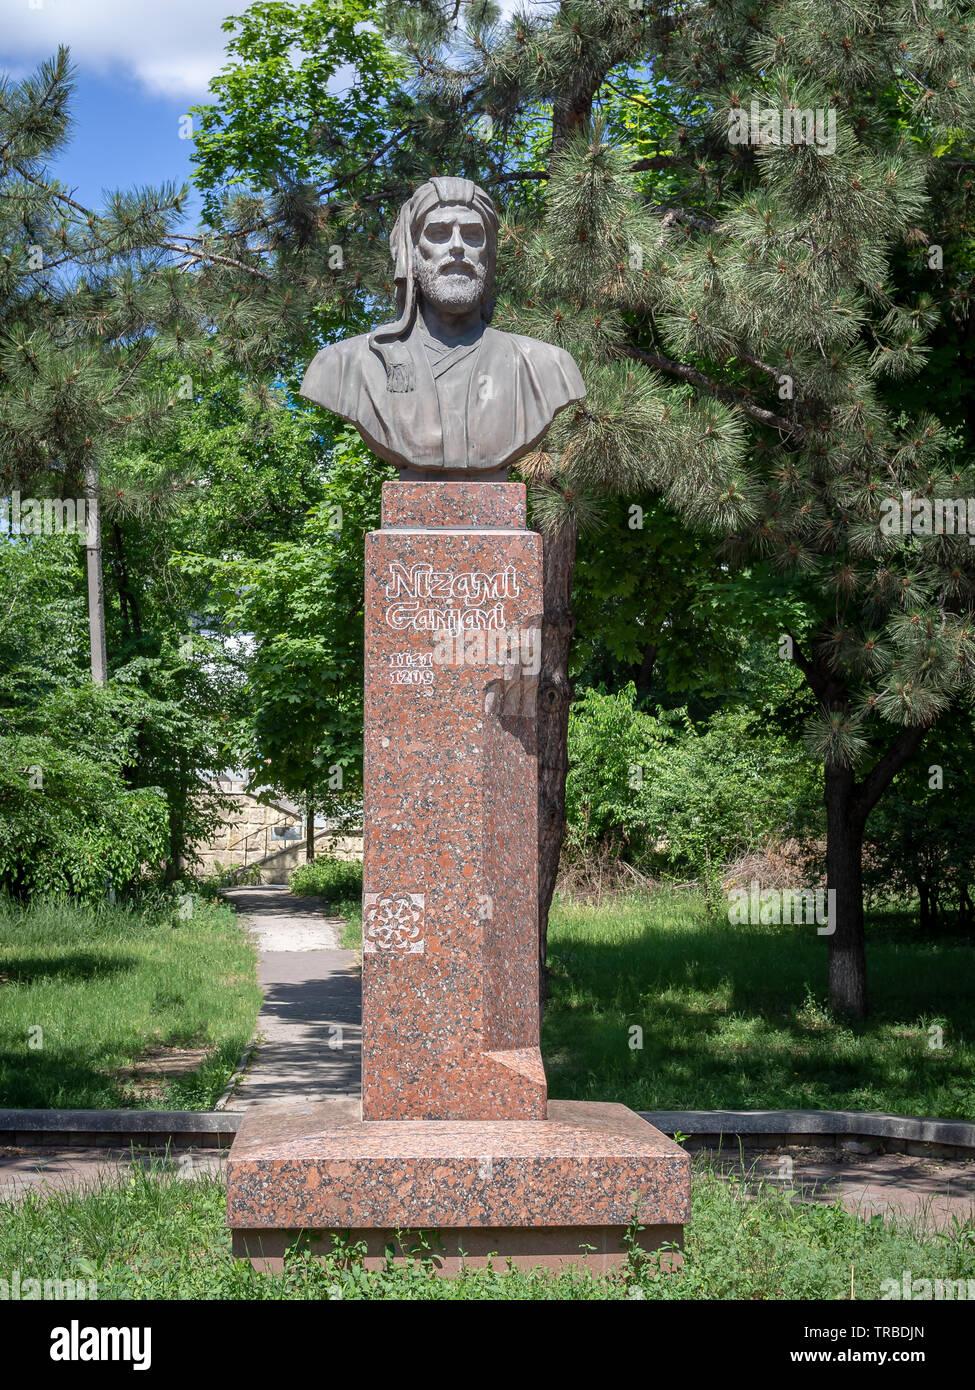 CHISINAU, MOLDOVA-JUNE 2, 2019: Nizami Ganjavi bust by Achir Ascherov - Stock Image